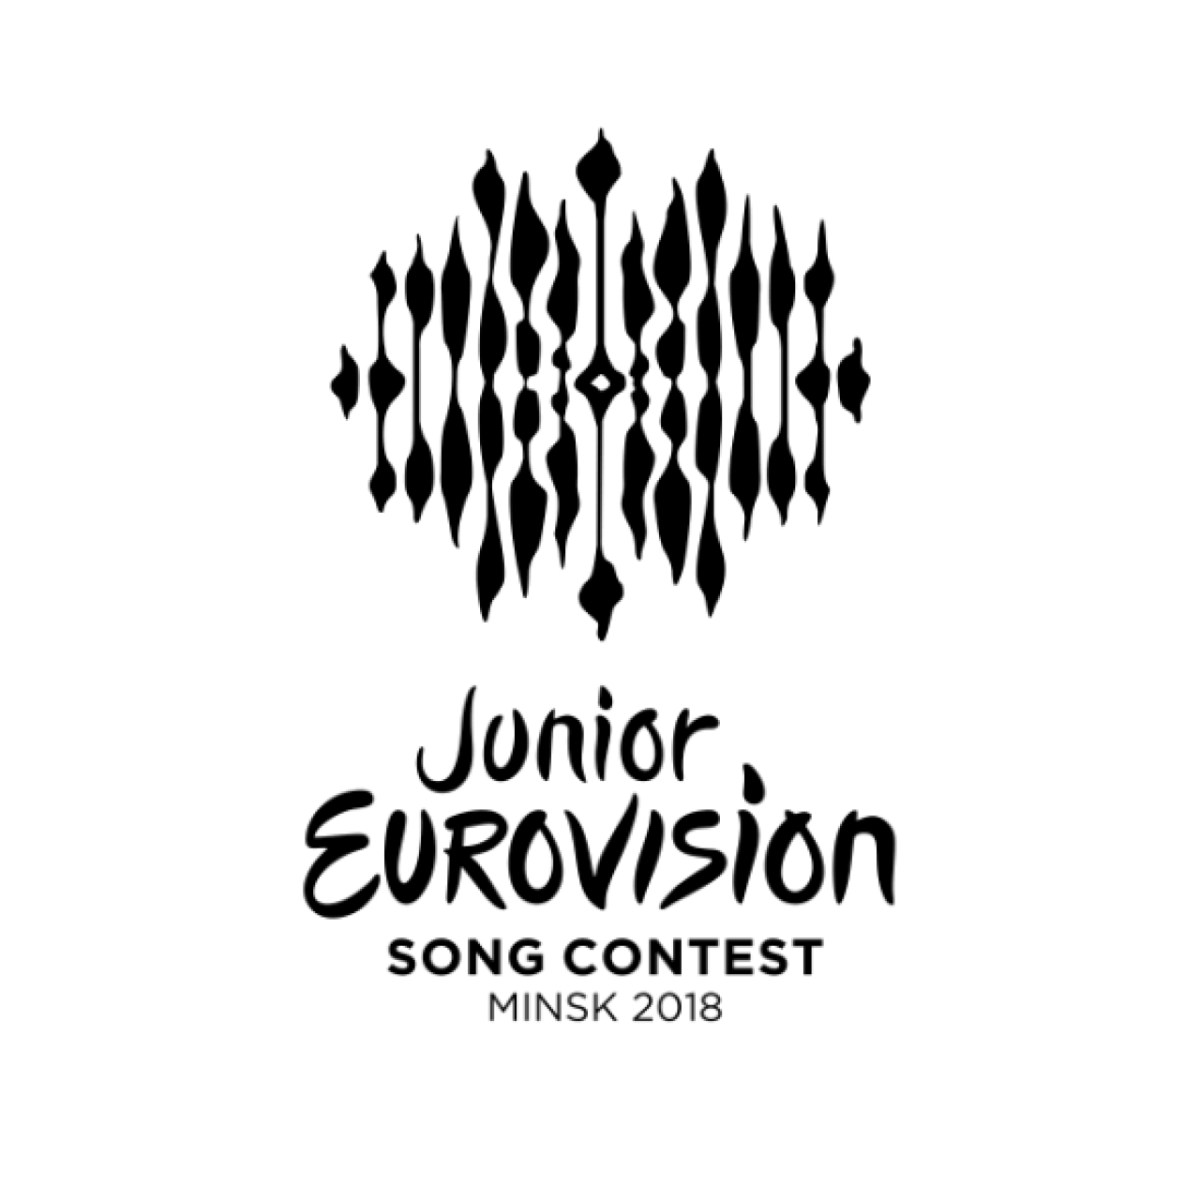 Junior Eurovision back in time: relive Minsk 2018